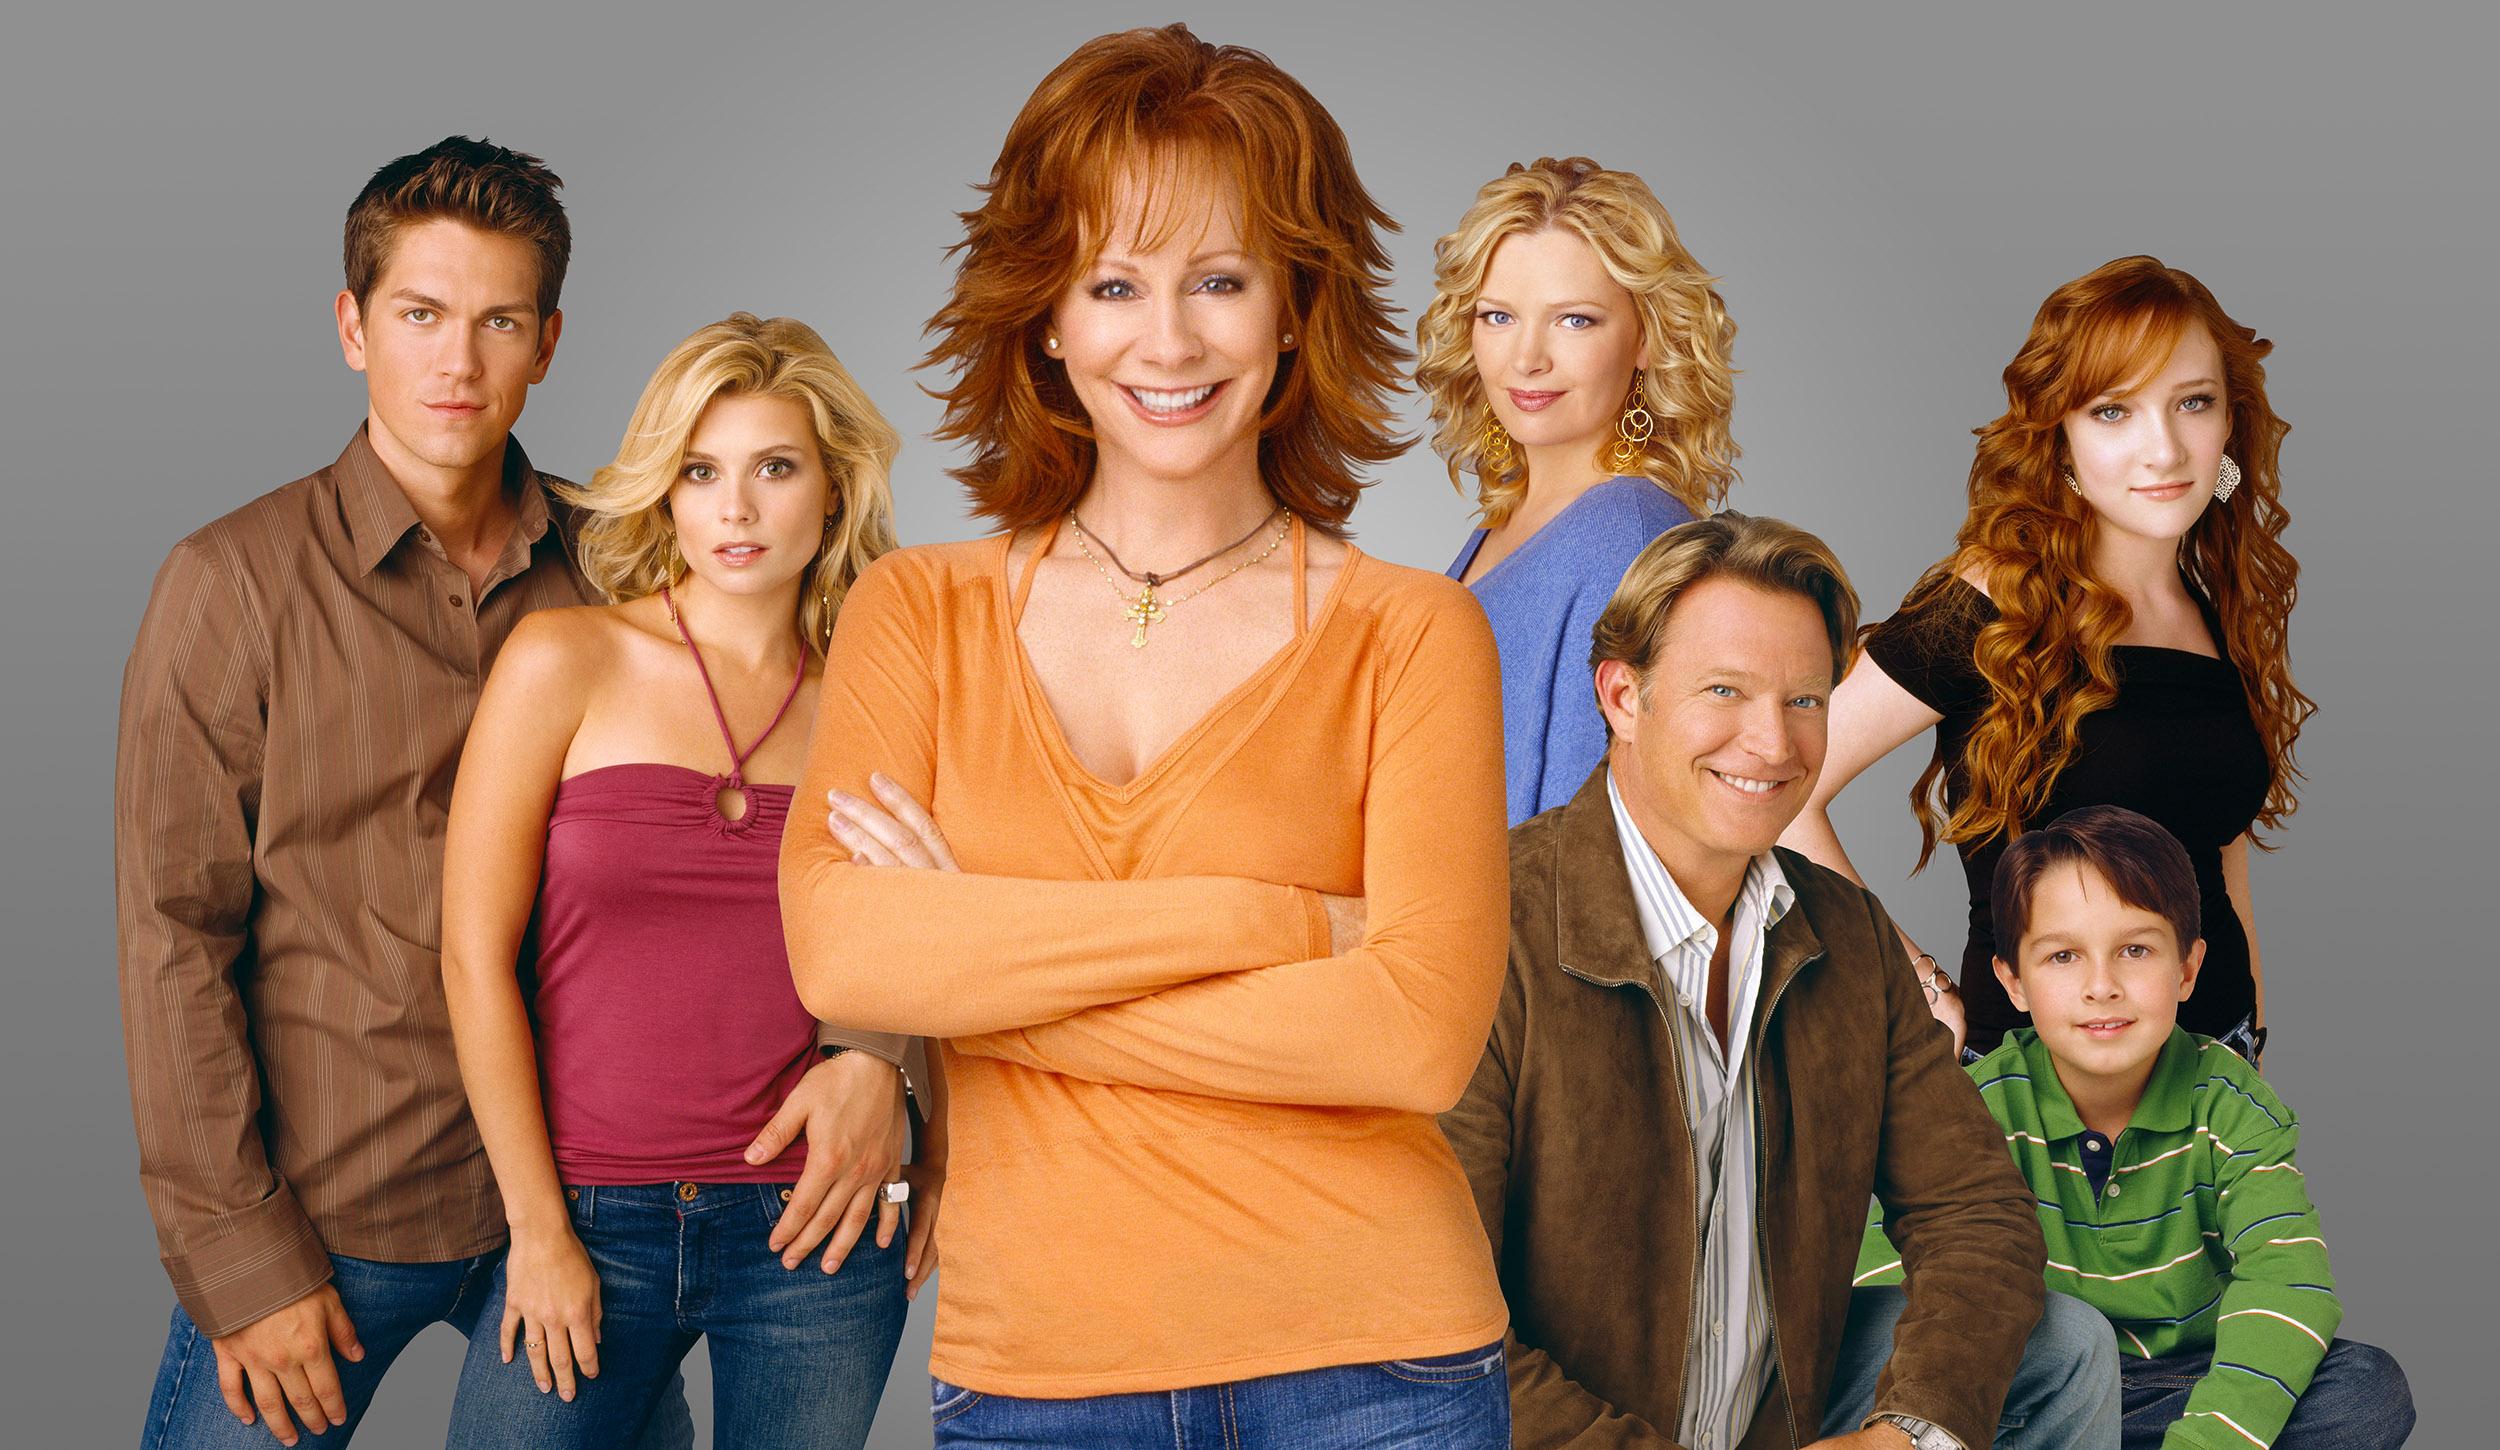 THE HART FAMILY  L-R: Van  (Steve Howey) , Cheyenne  (JoAnna Garcia) , Reba  (Reba McEntire) , Barbra Jean  (Melissa Peterman) , Brock  (Chris Rich) , Kyra  (Scarlett Pomers) , Jake  (Mitch Holleman)